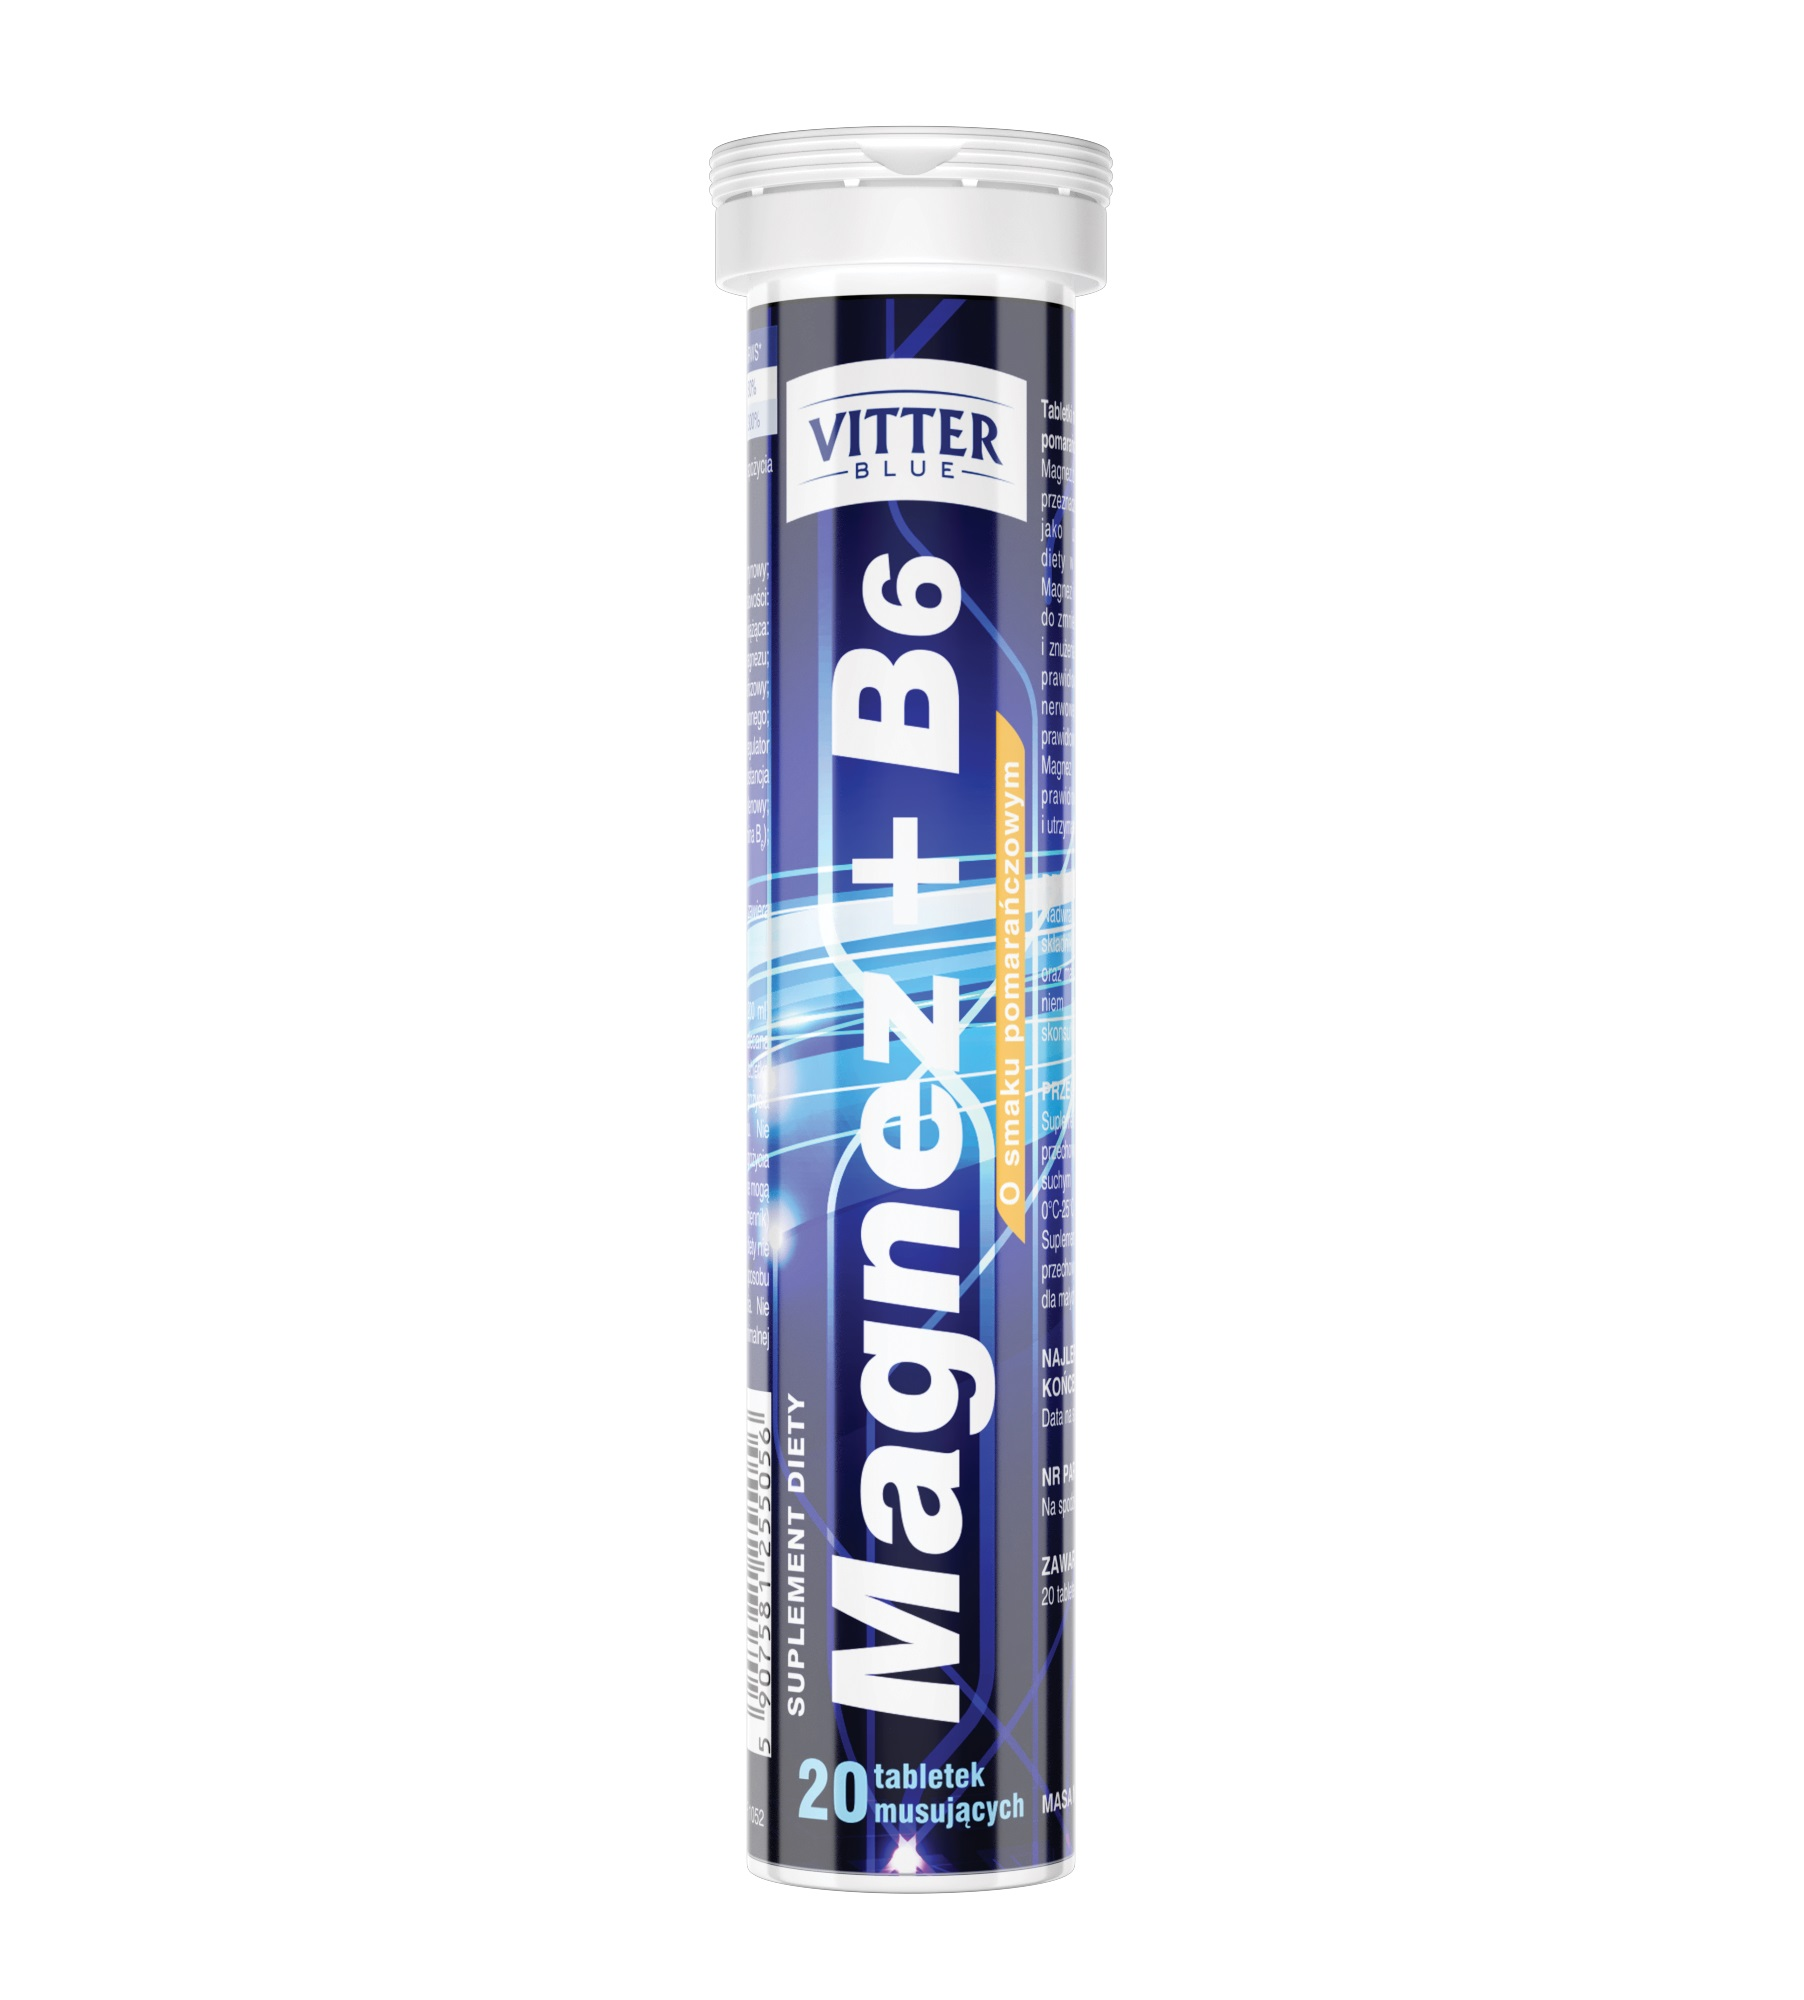 Suplement diety Magnez + B6 w tabletkach musujących Vitter Blue - tabletki musujące